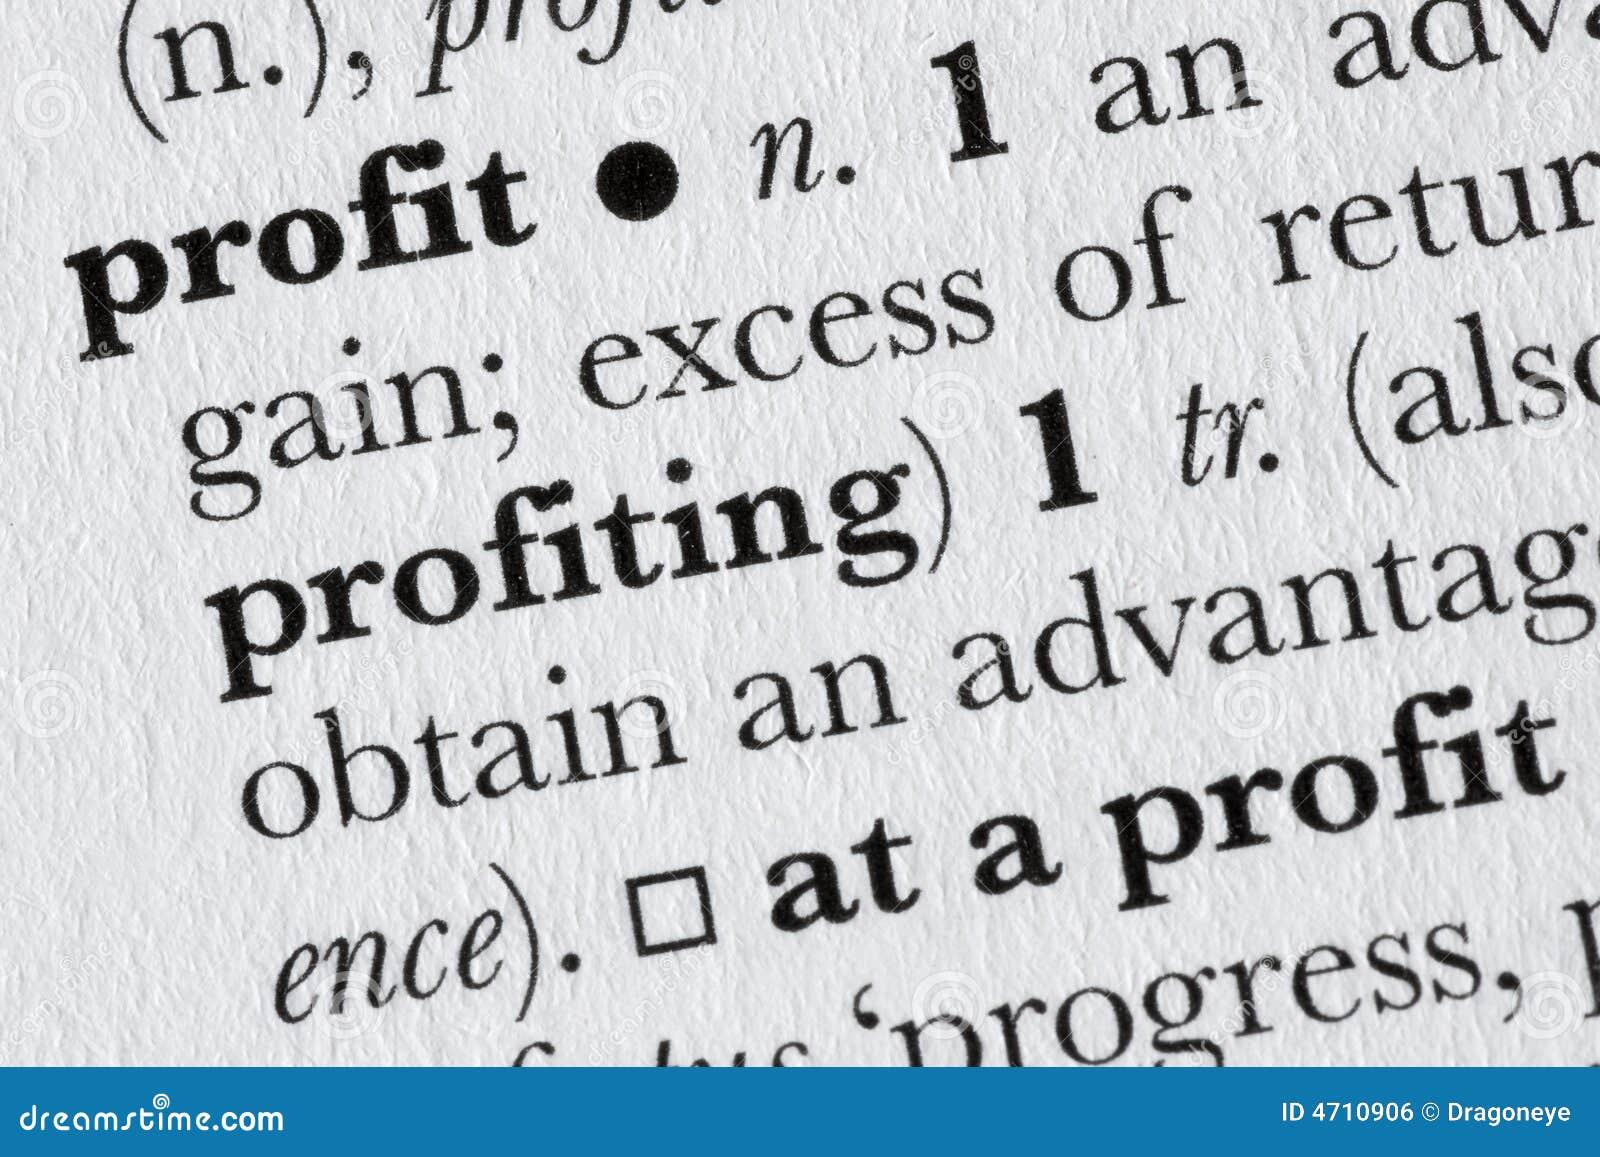 profit dictionary